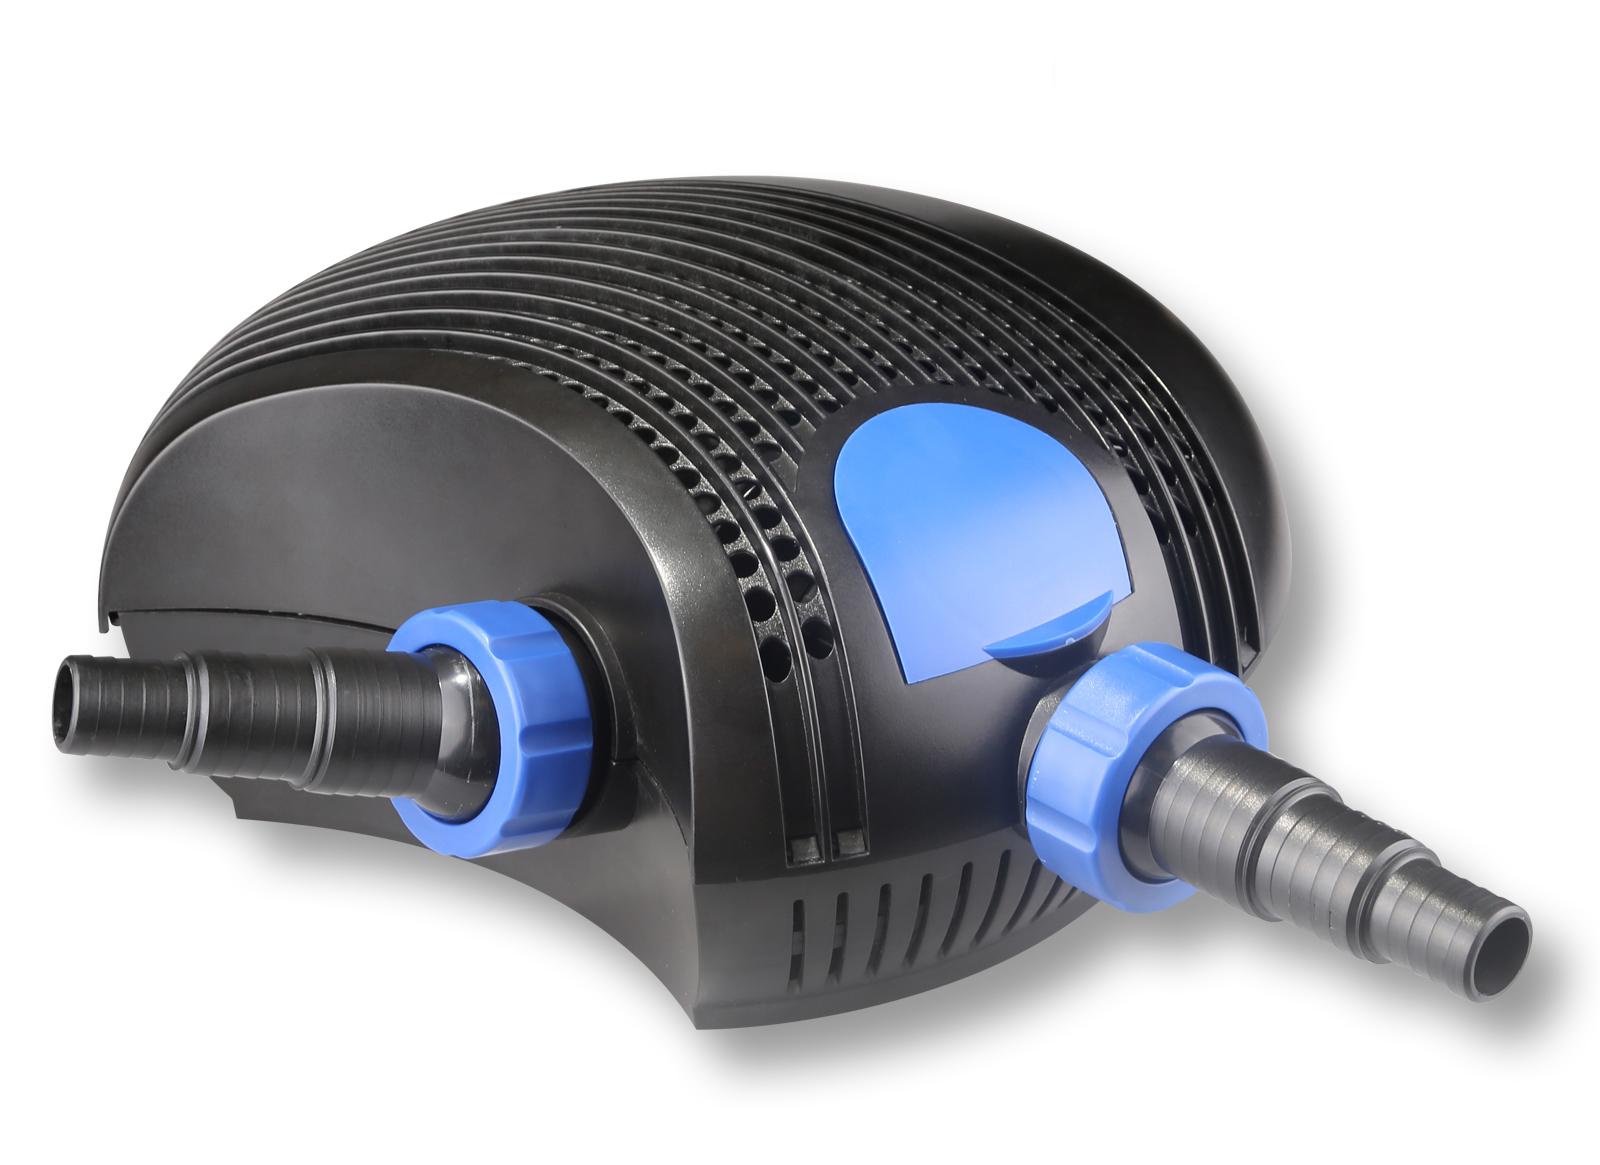 sunsun 10000l h 80w supereco pompe de bassin p filtre. Black Bedroom Furniture Sets. Home Design Ideas